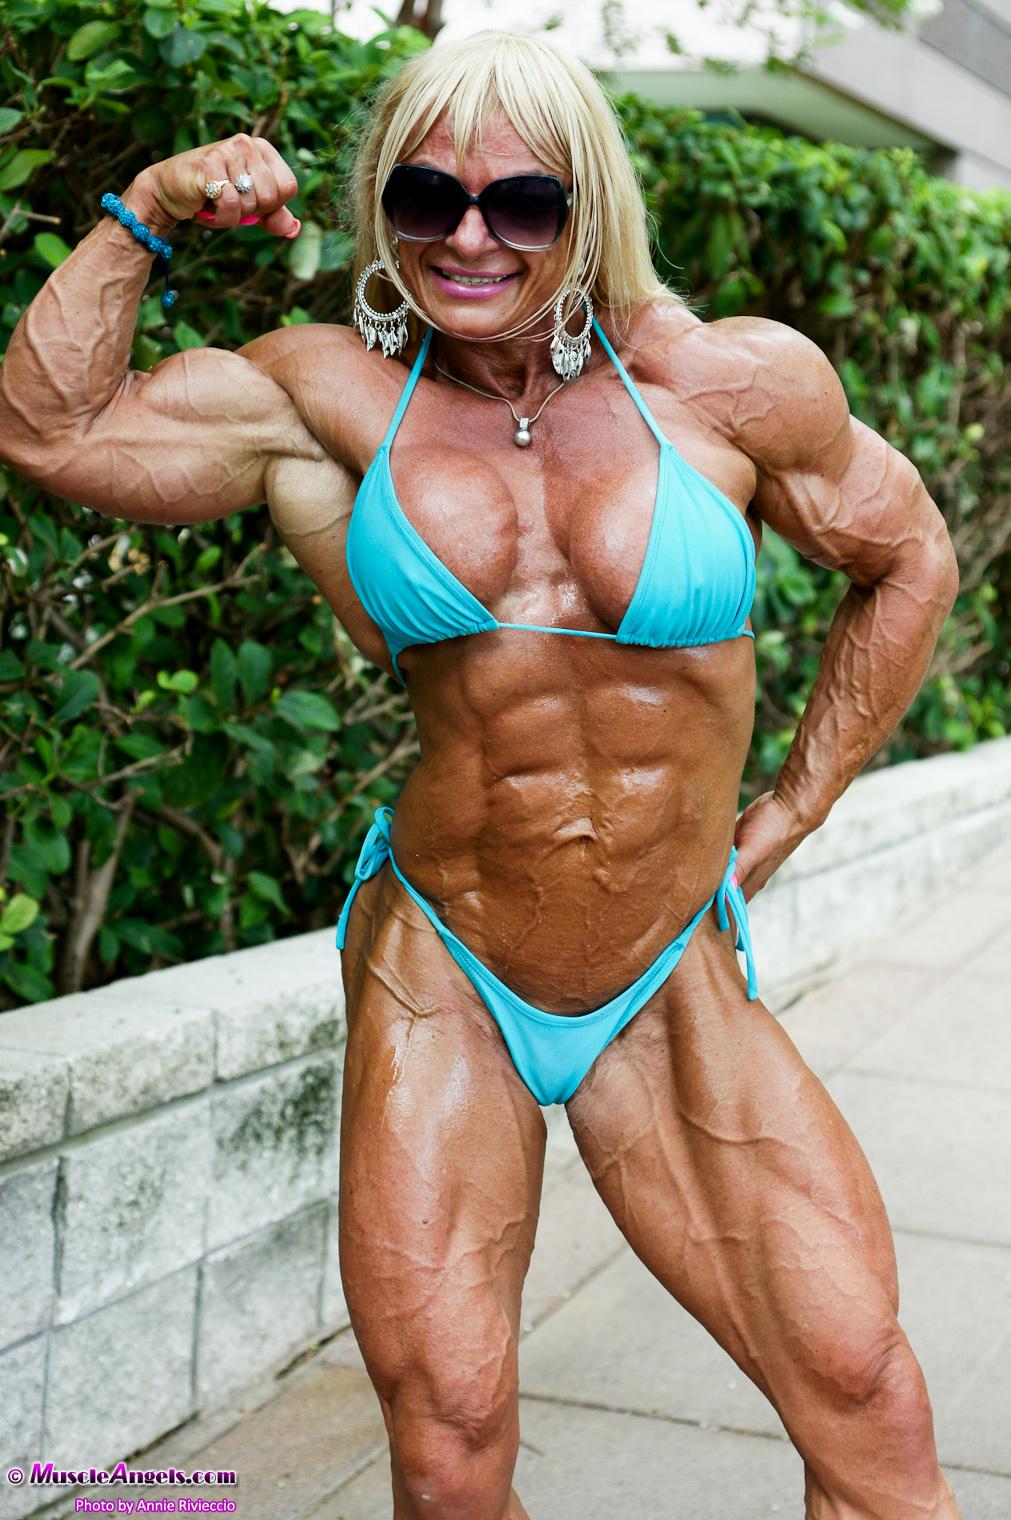 Female Bodybuilder Maryse Manios - Photo by Muscle Angels